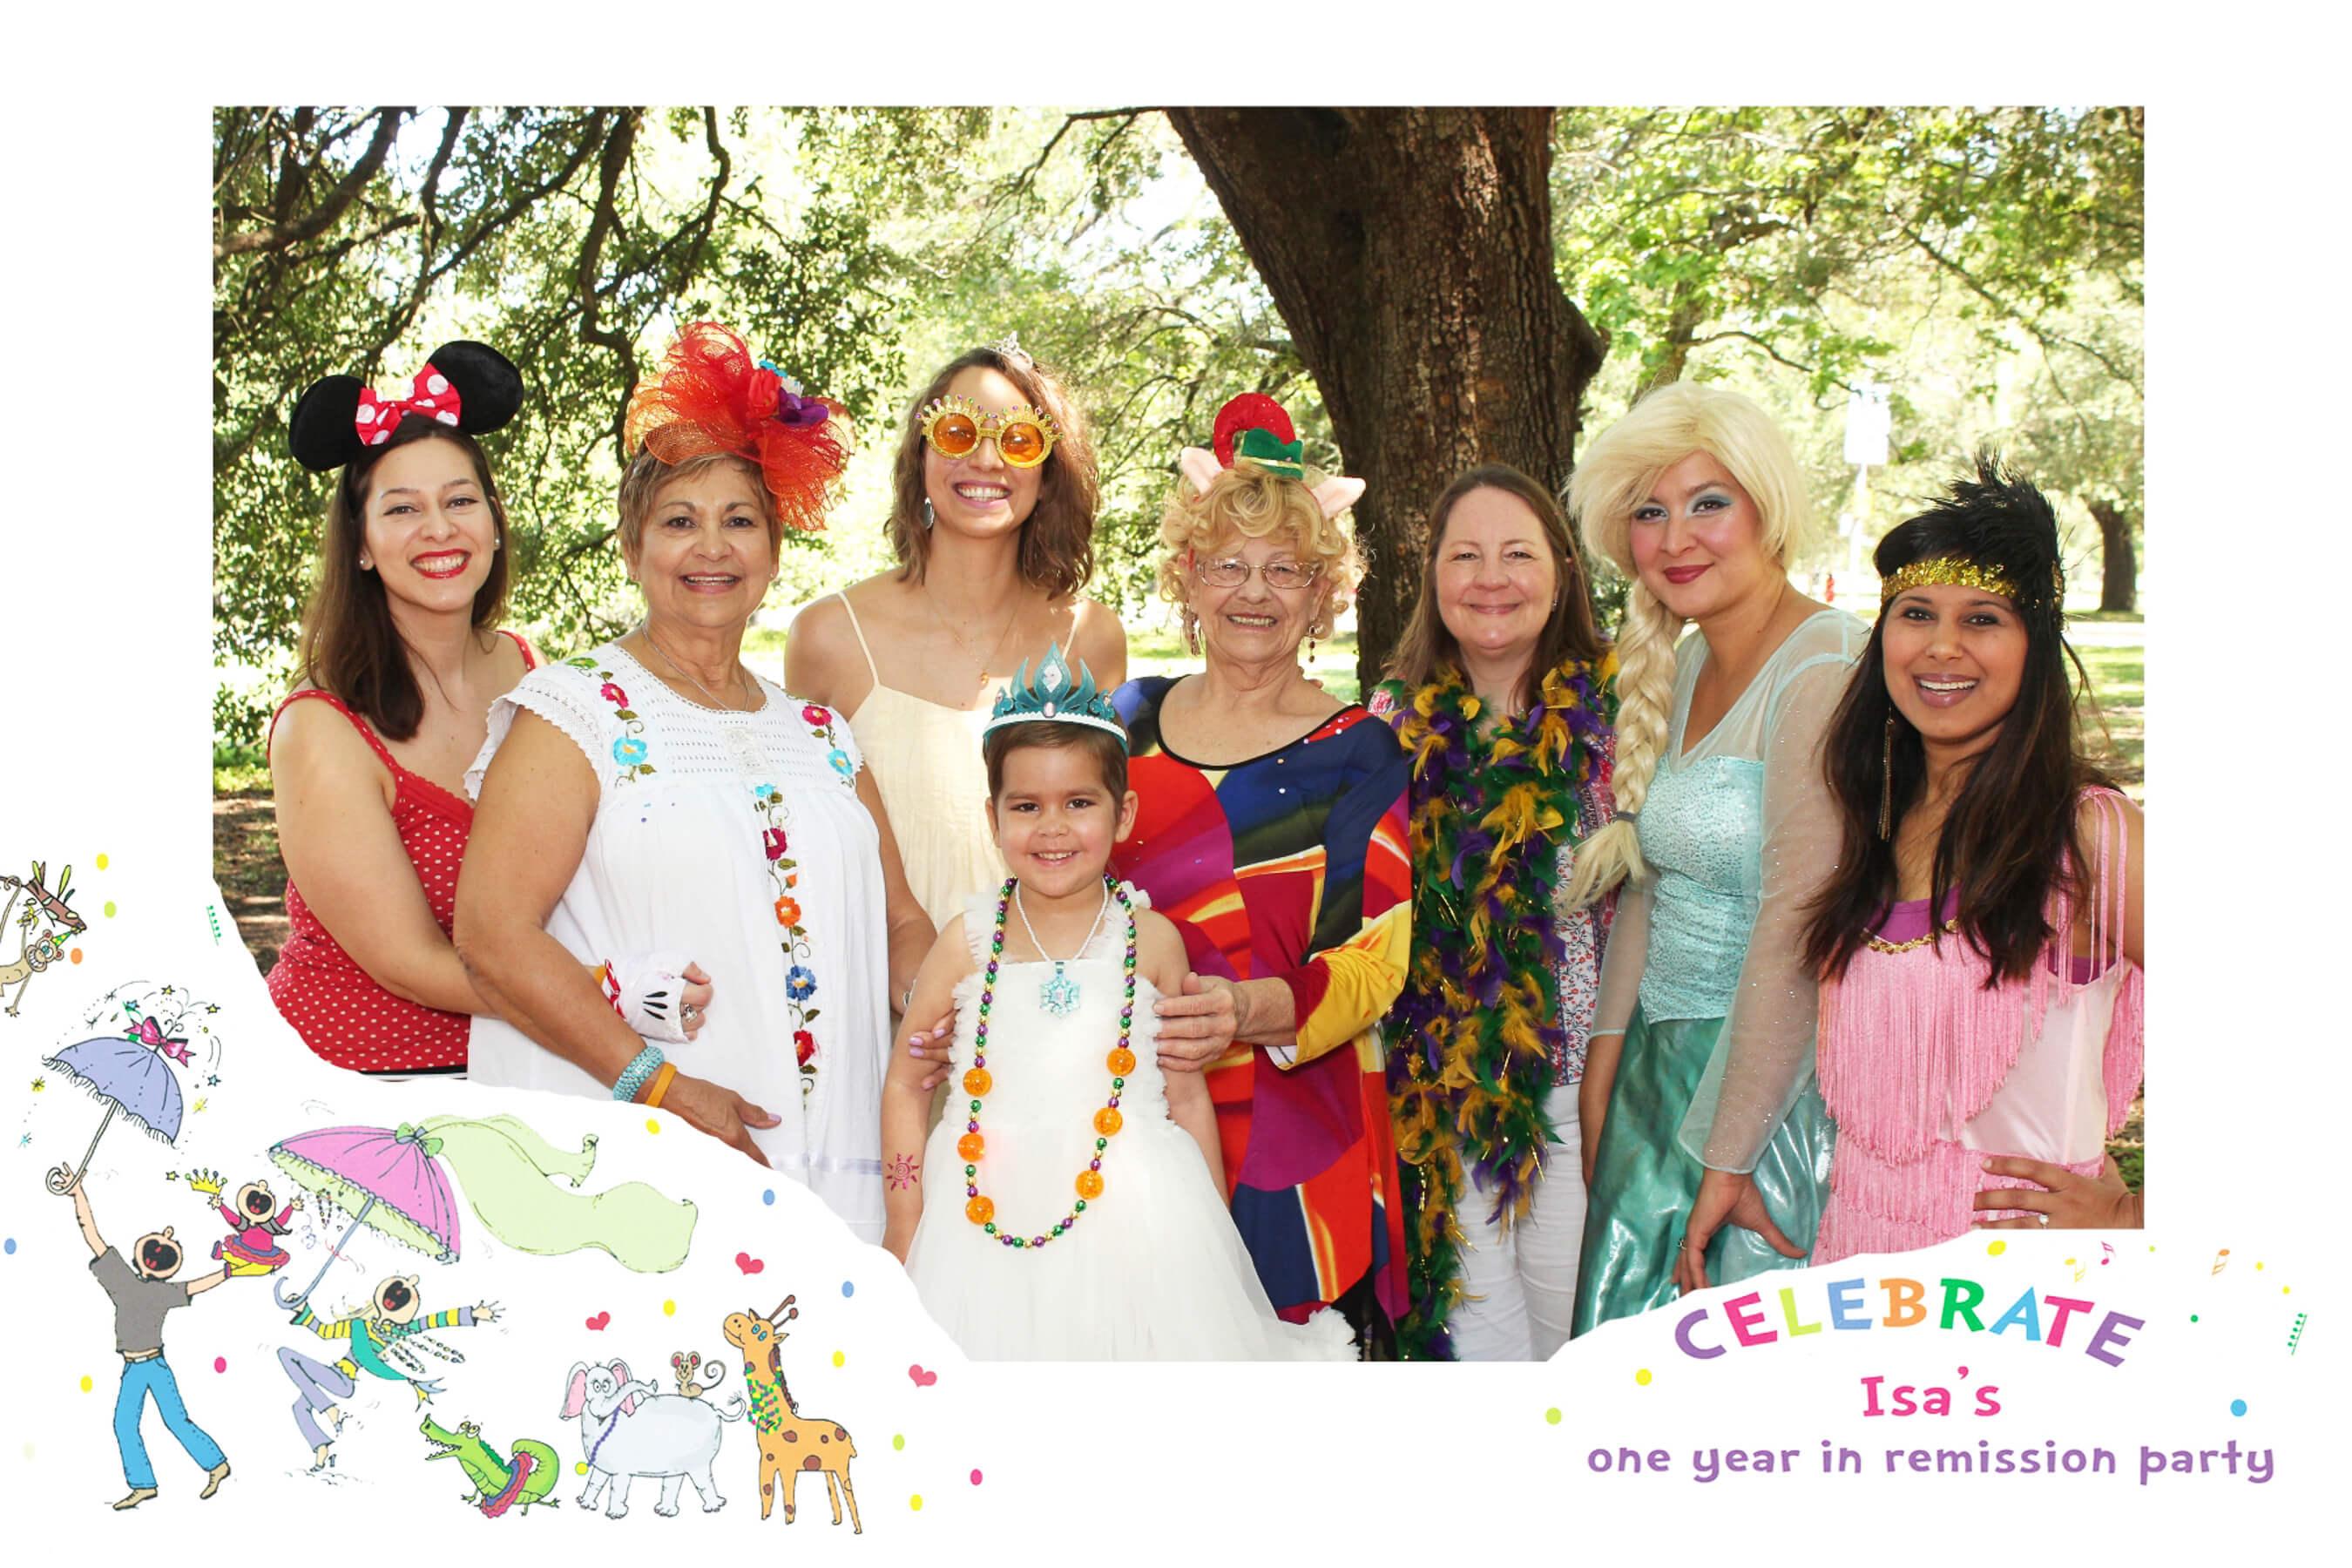 7 women celebrating a girls birthday